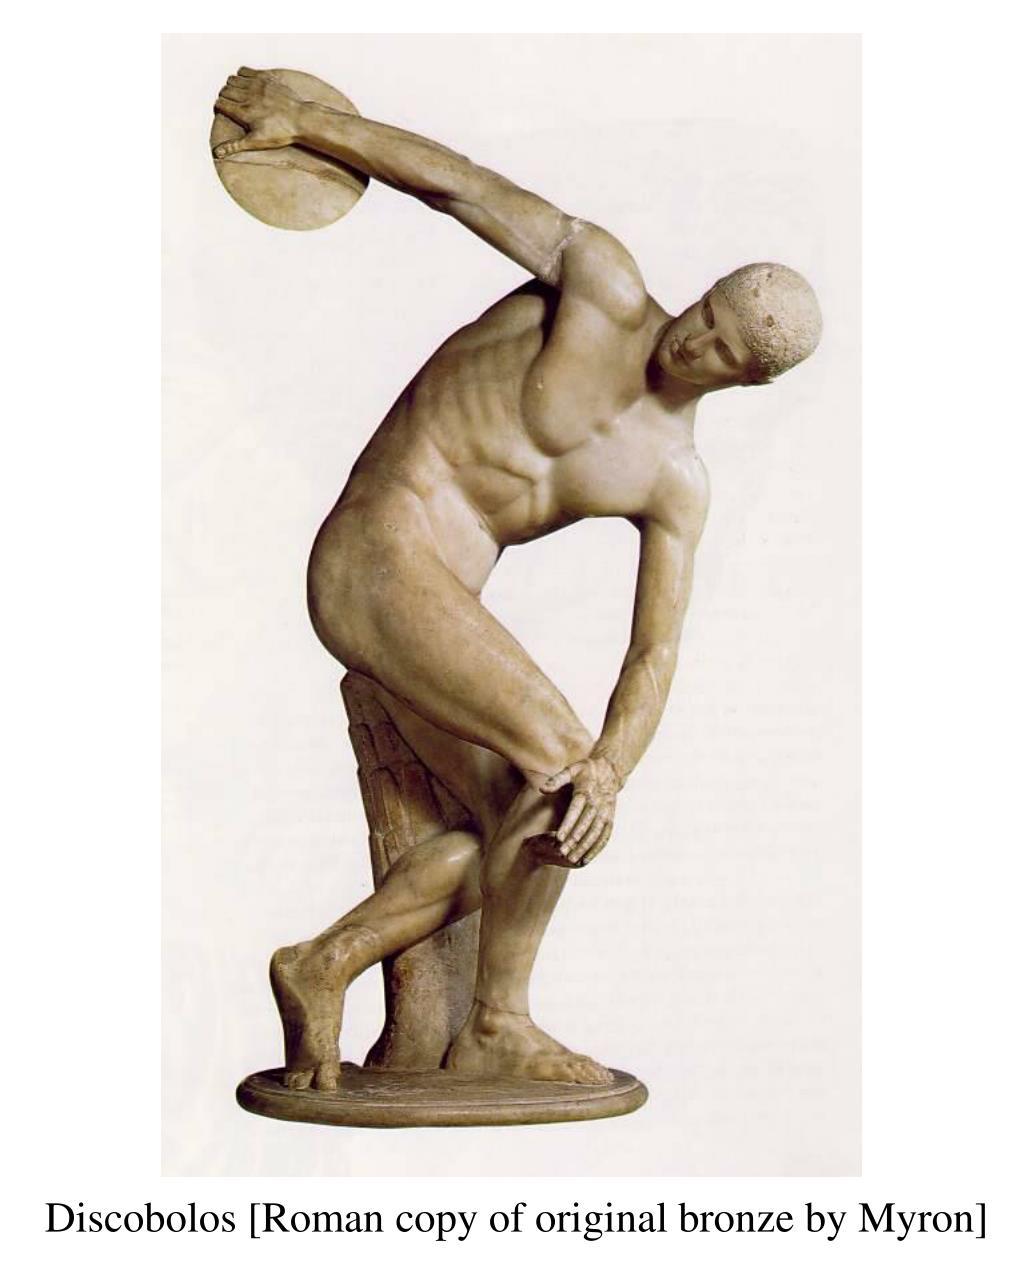 Discobolos [Roman copy of original bronze by Myron]